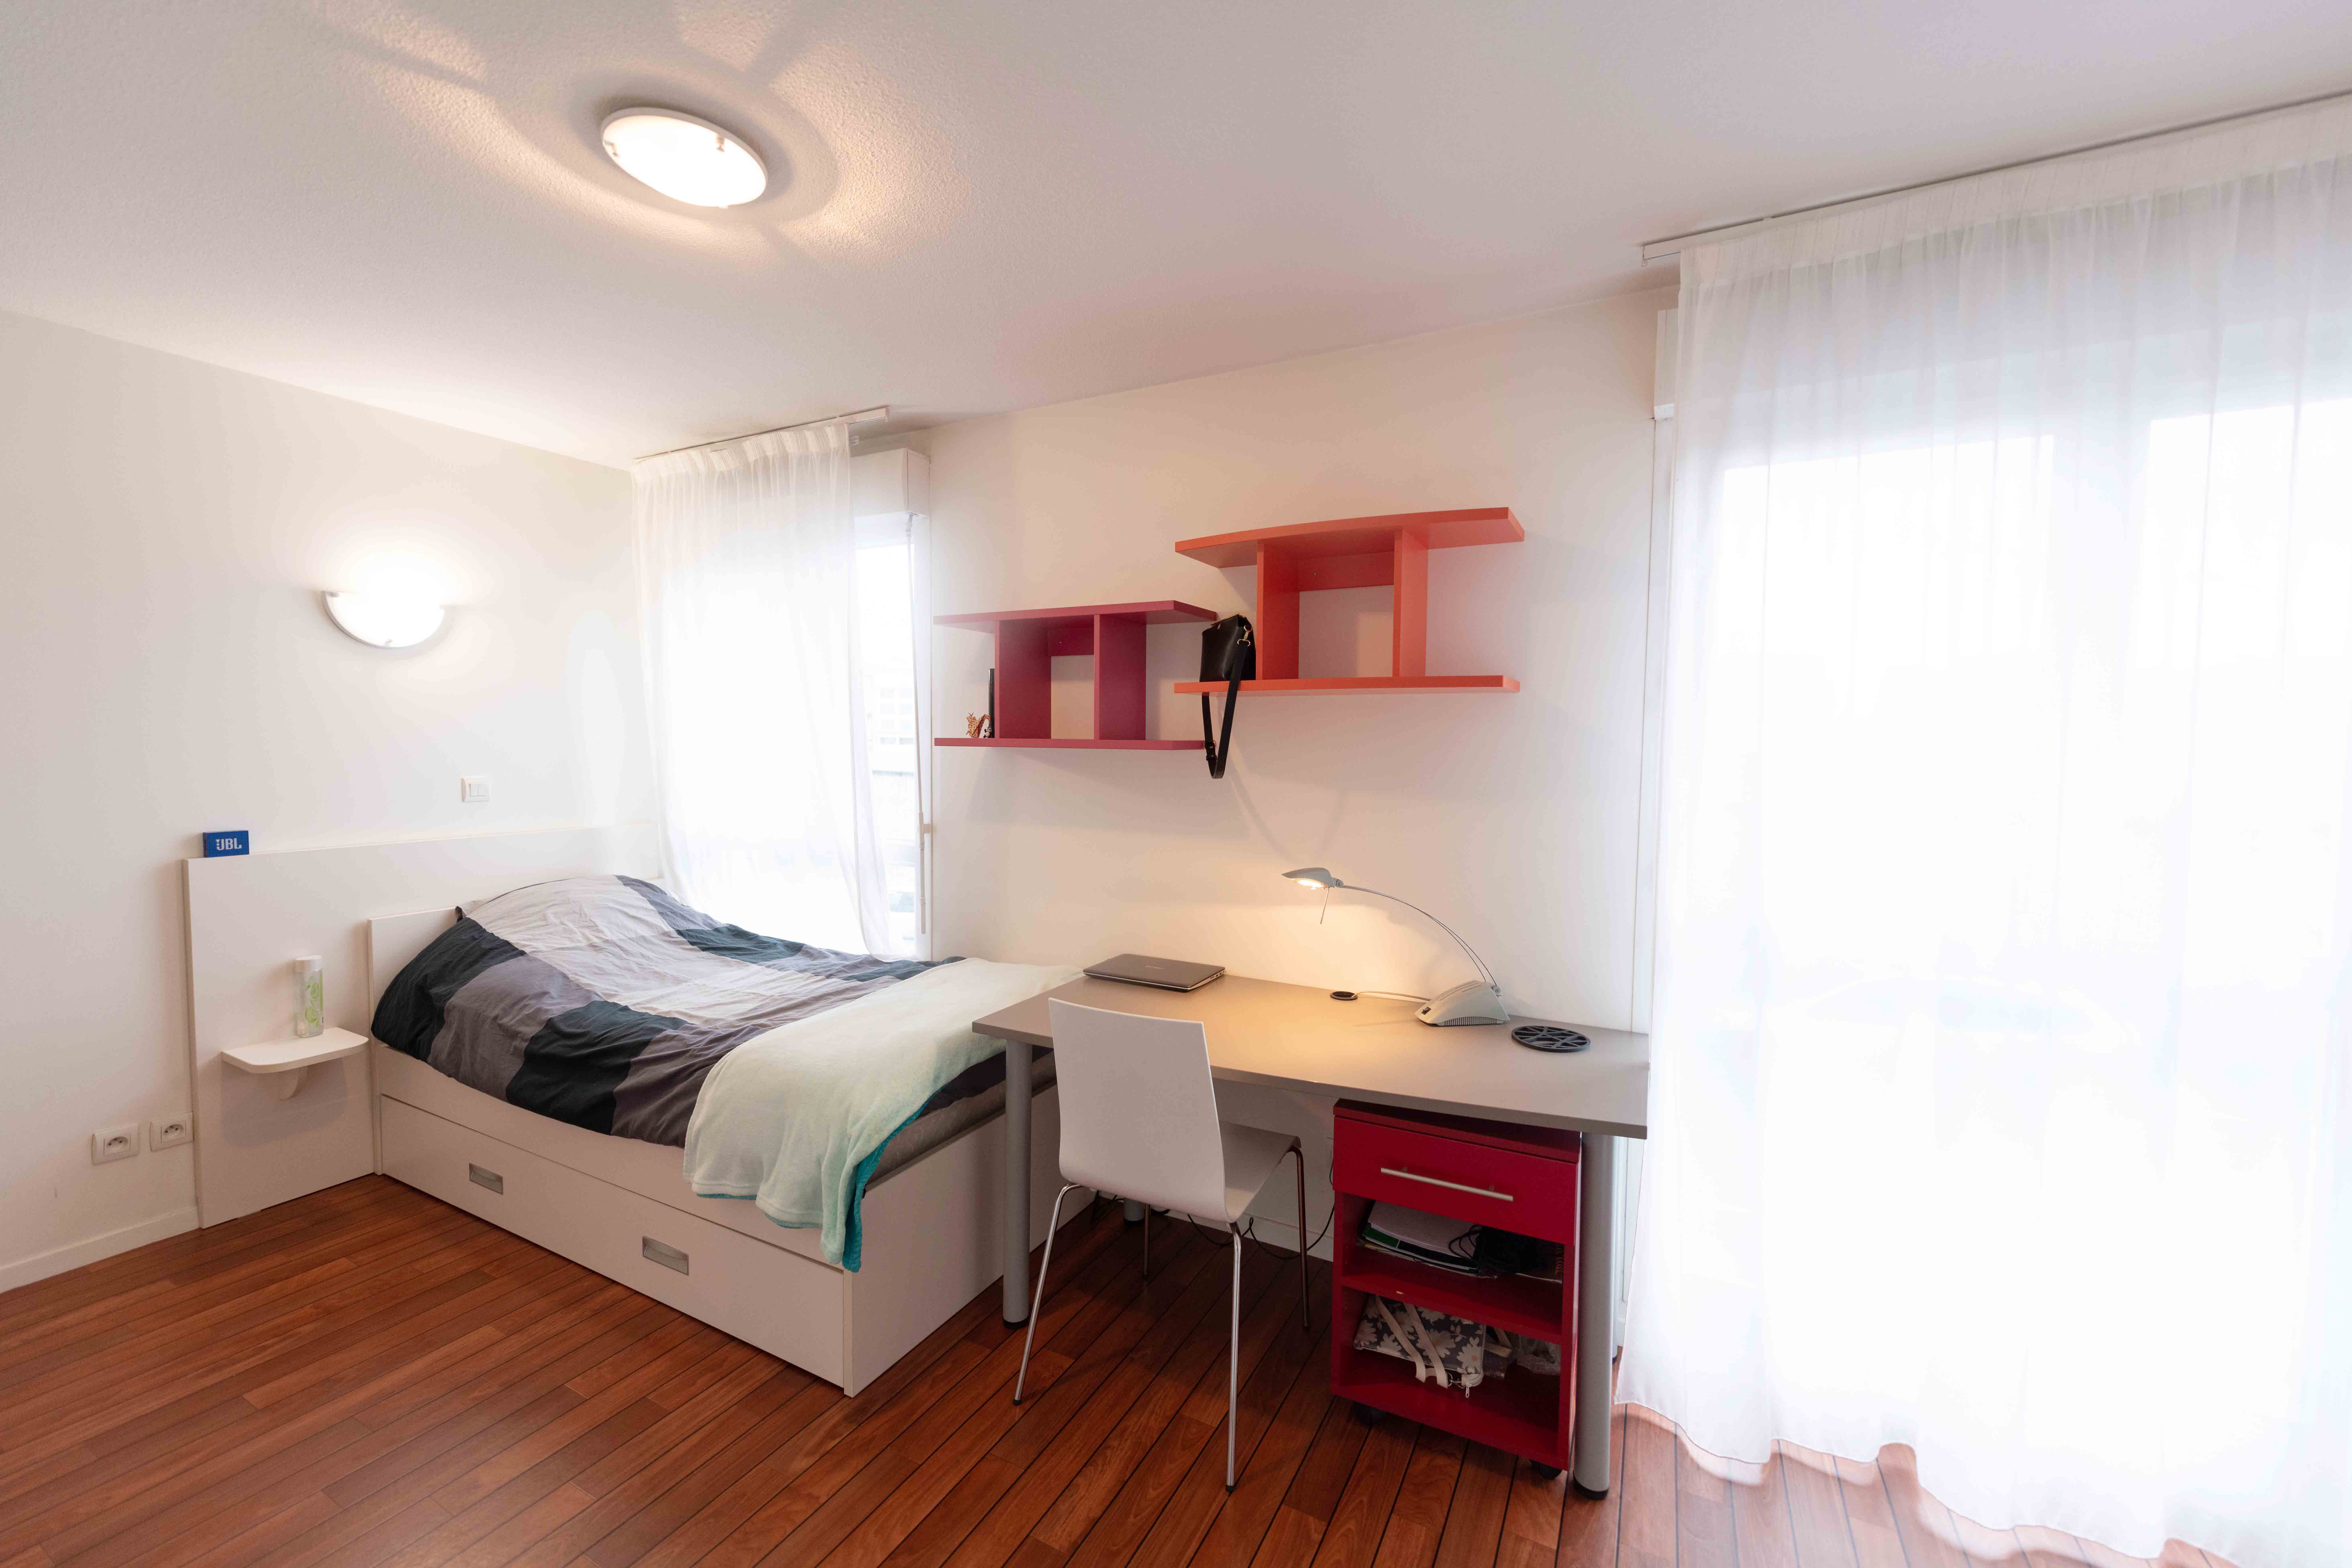 image  2020 01 23 residence etudiante suitetudes megara lyon studio 16